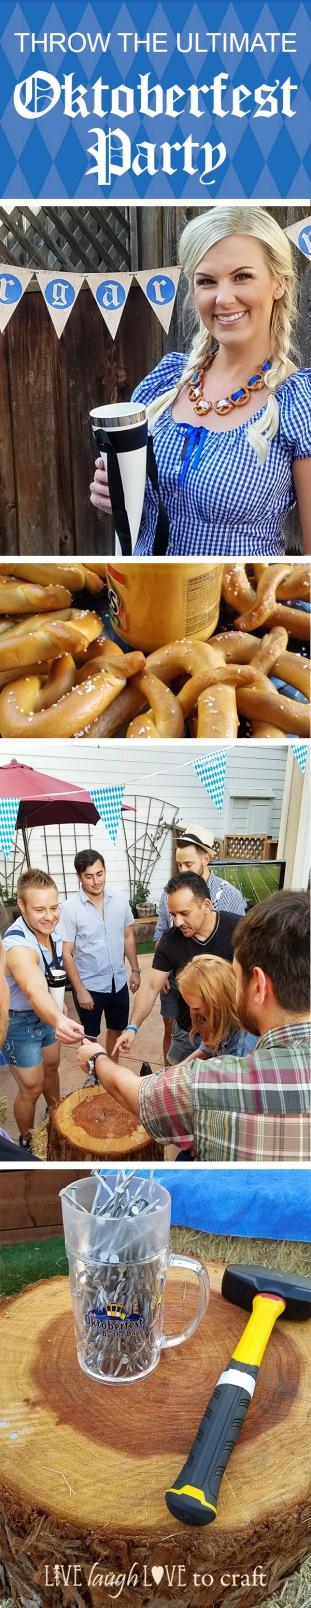 blog-throw-the-ultimate-oktoberfest-themed-fall-party-ideas.jpg